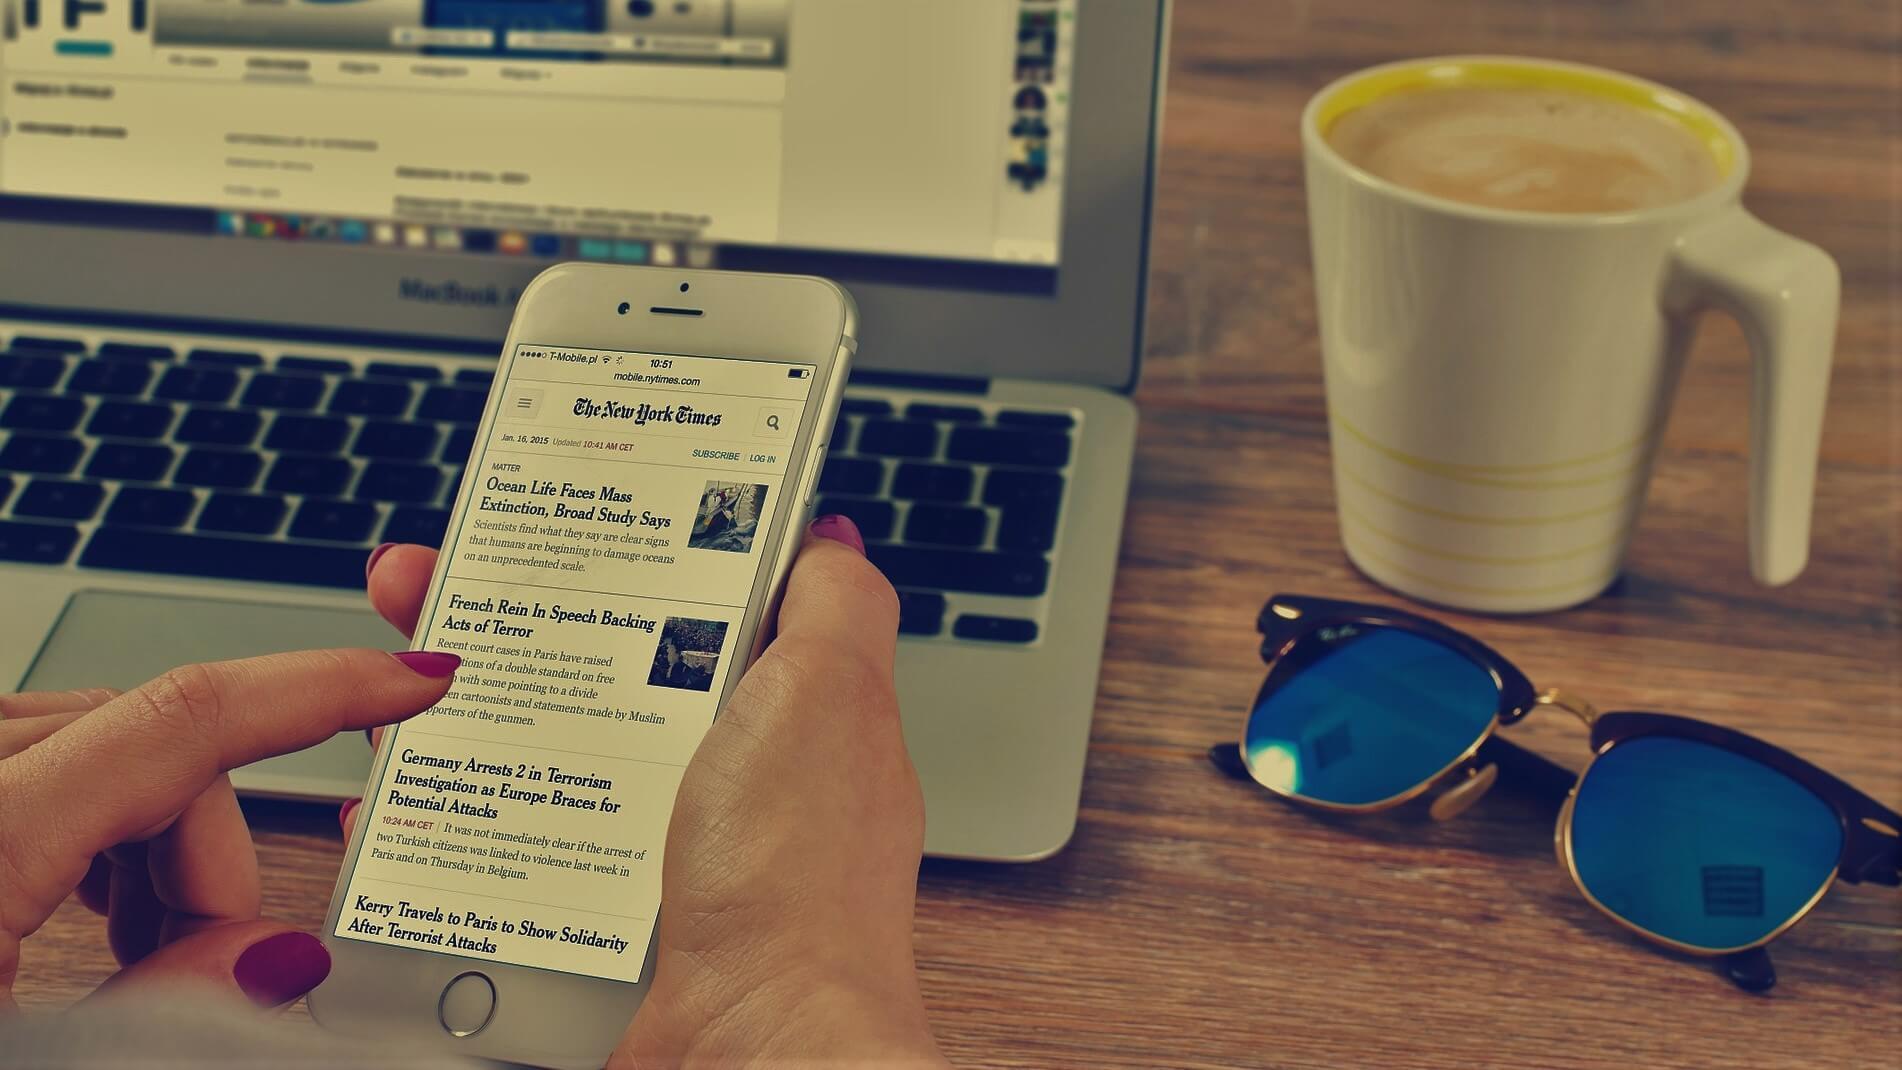 Digital Marketing News: What happened in the digital marketing world so far?